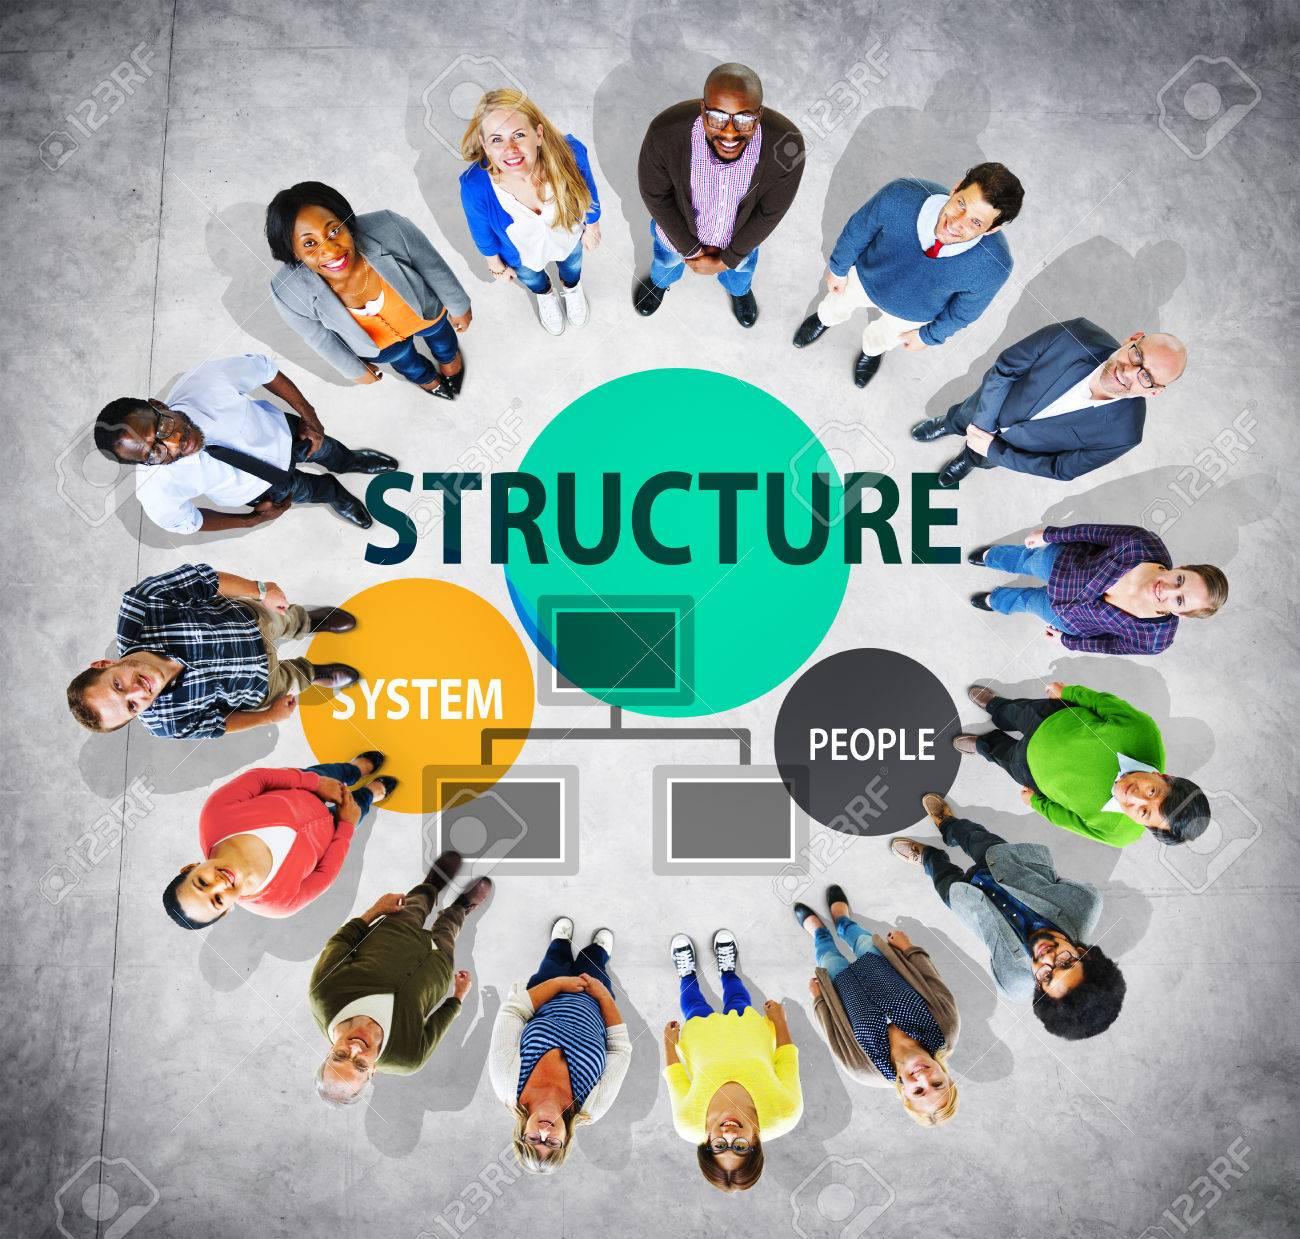 Business Structure Flowchart Corporate Organization Concept - 52350355